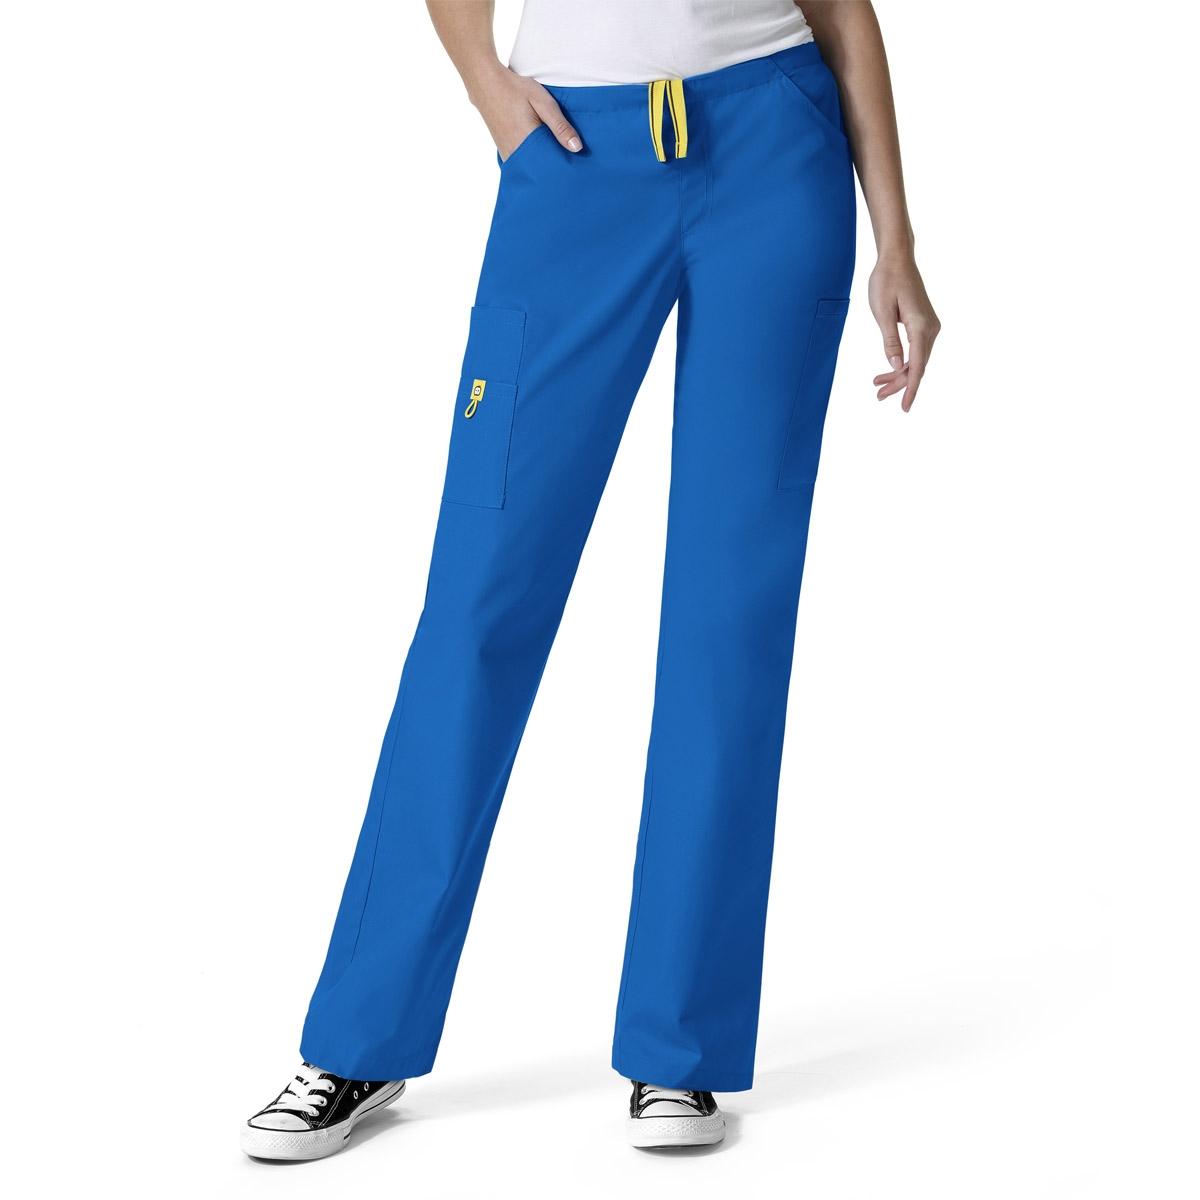 6725b0a5378 Straight Leg Nine Pocket Scrub Pants Origin Victor - WonderWink Scrubs